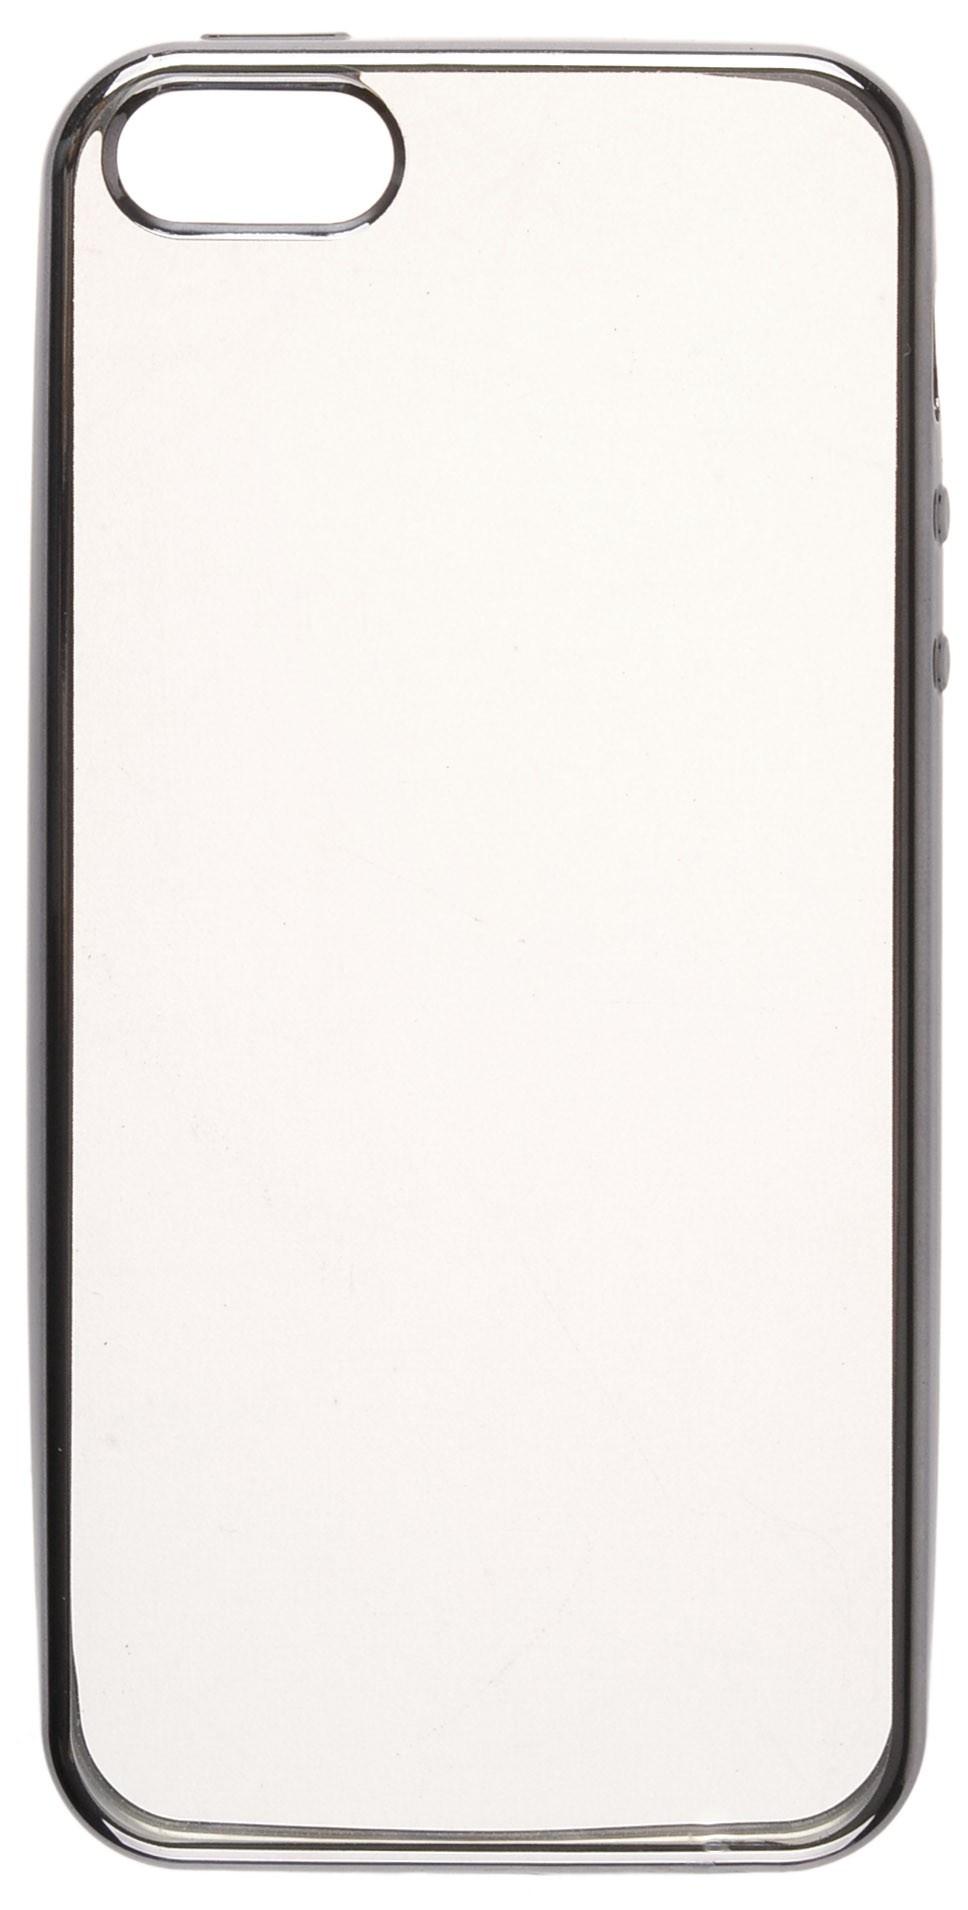 Накладка skinBOX для Apple Iphone 5/5S, 2000000095820, черный booratino деревянная накладка для iphone 5 5s орех